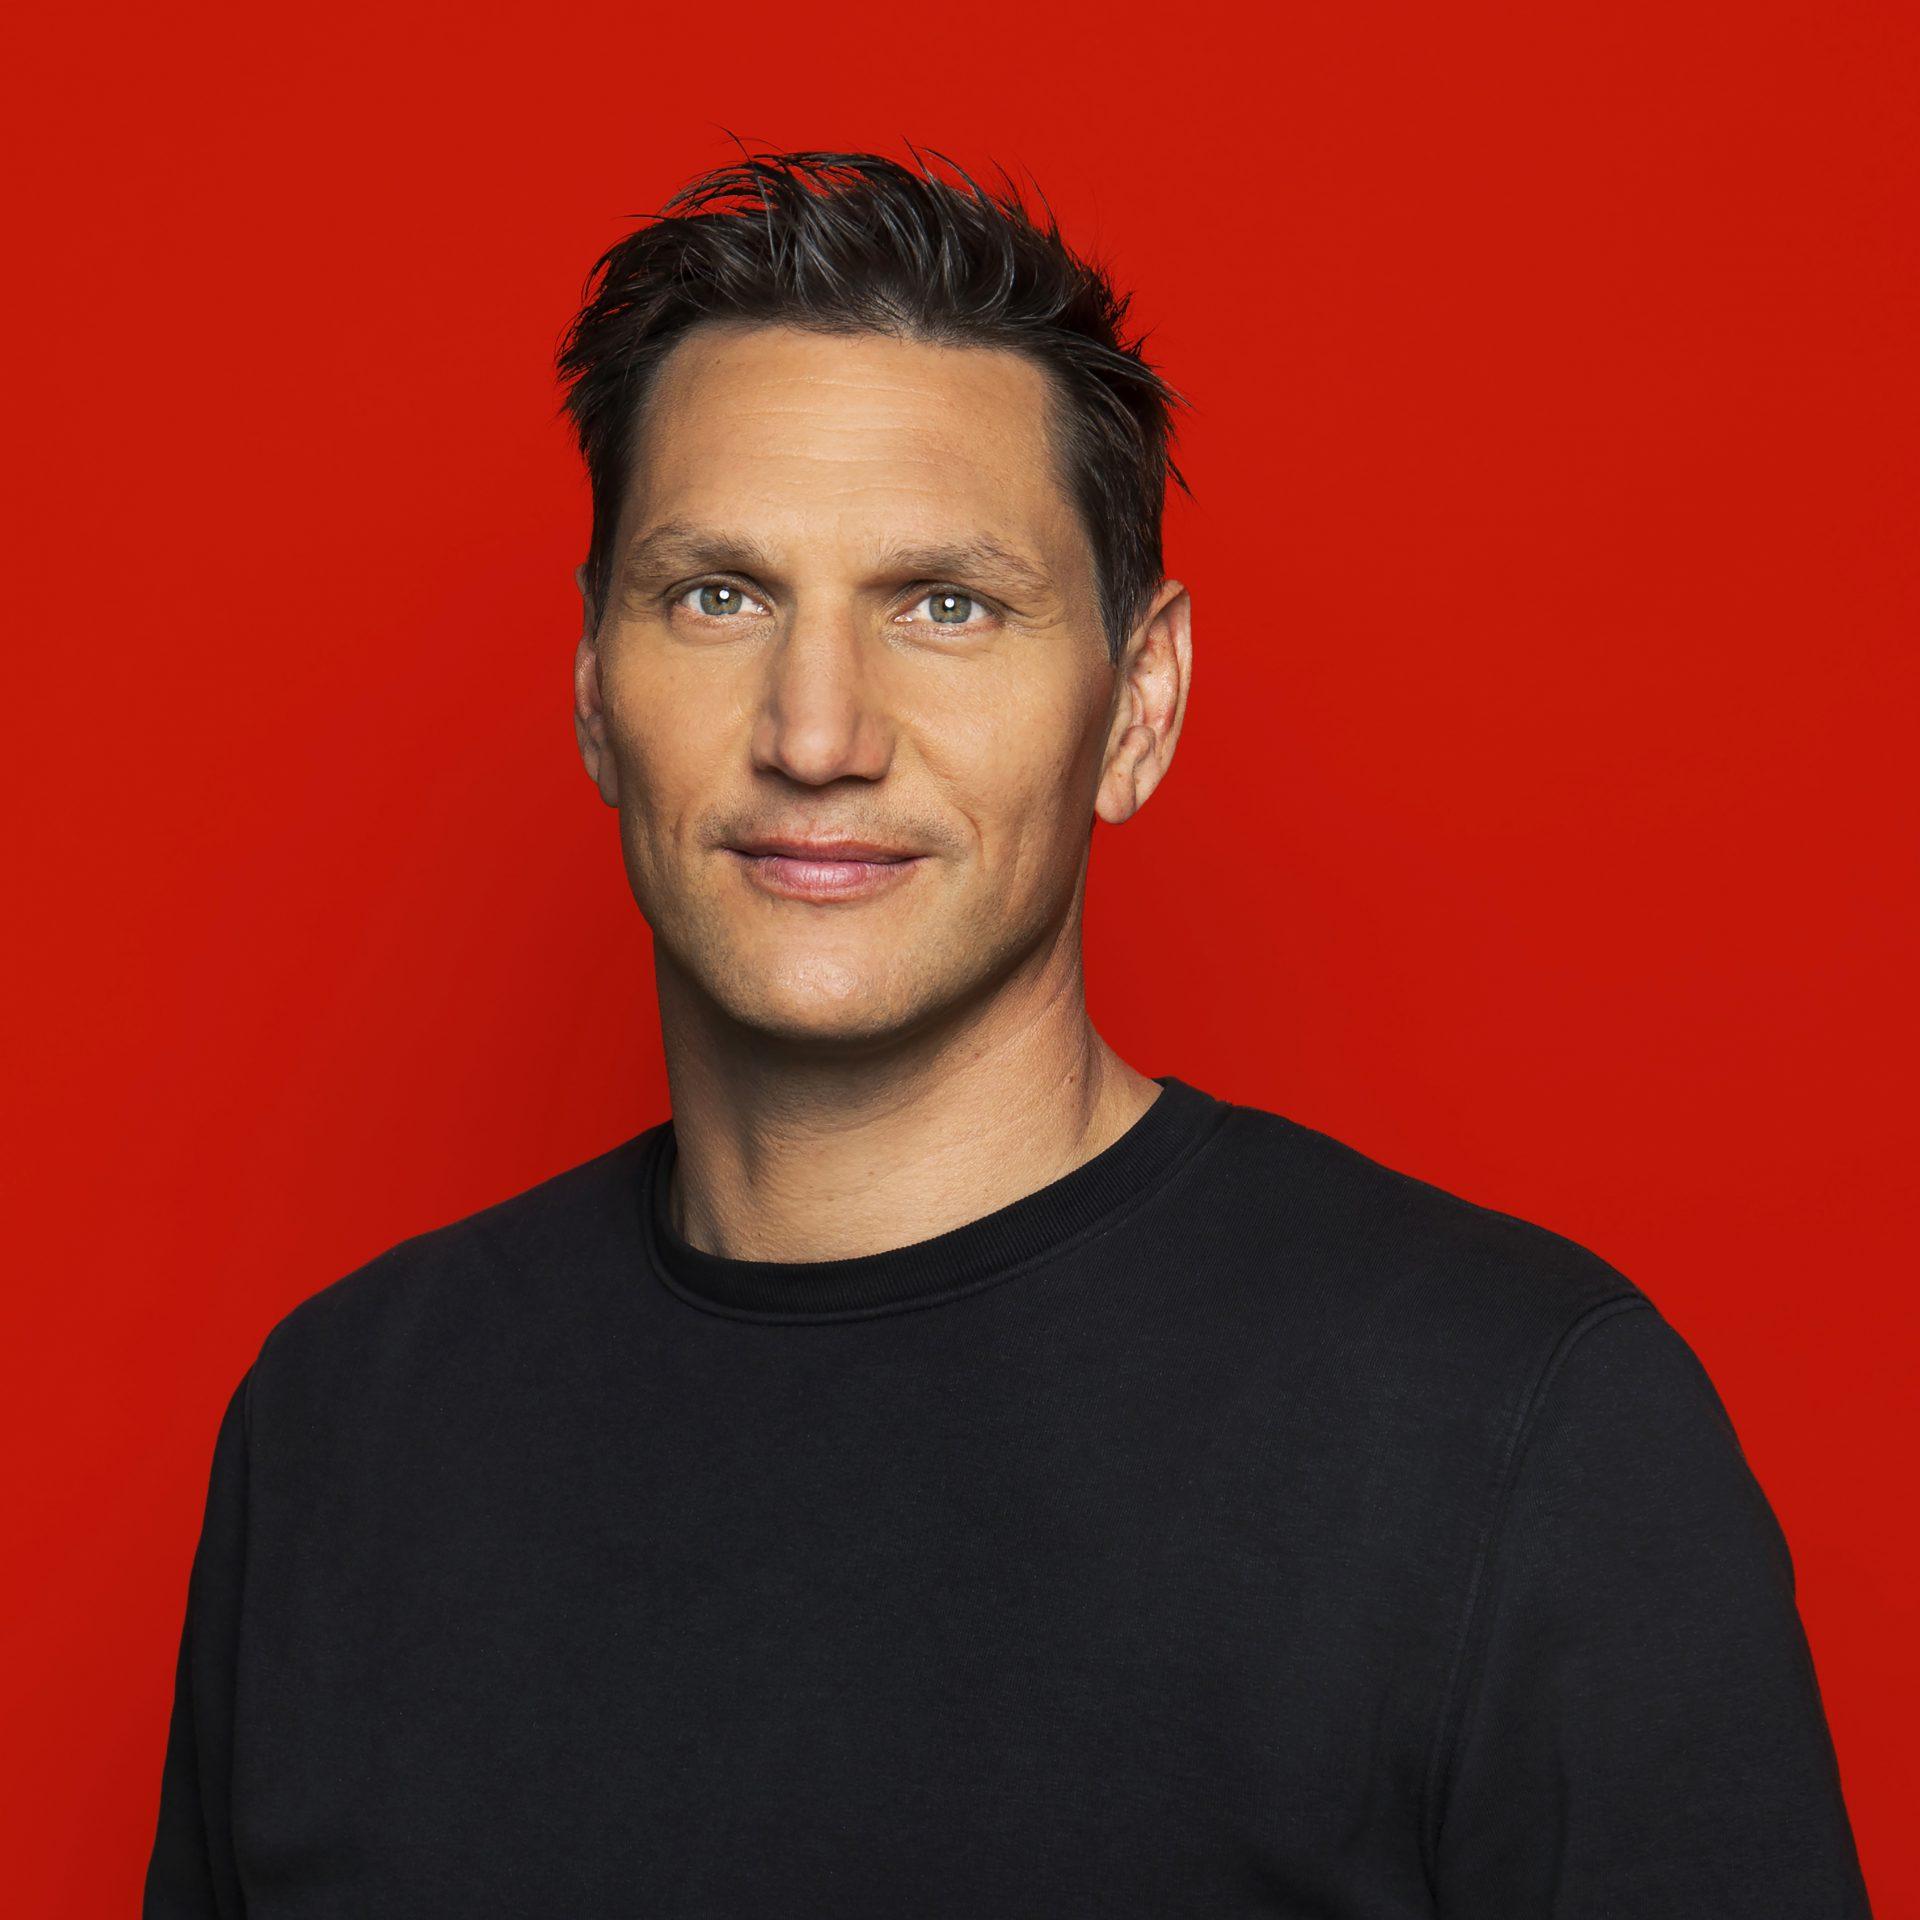 Jan Maarten Kloosterman